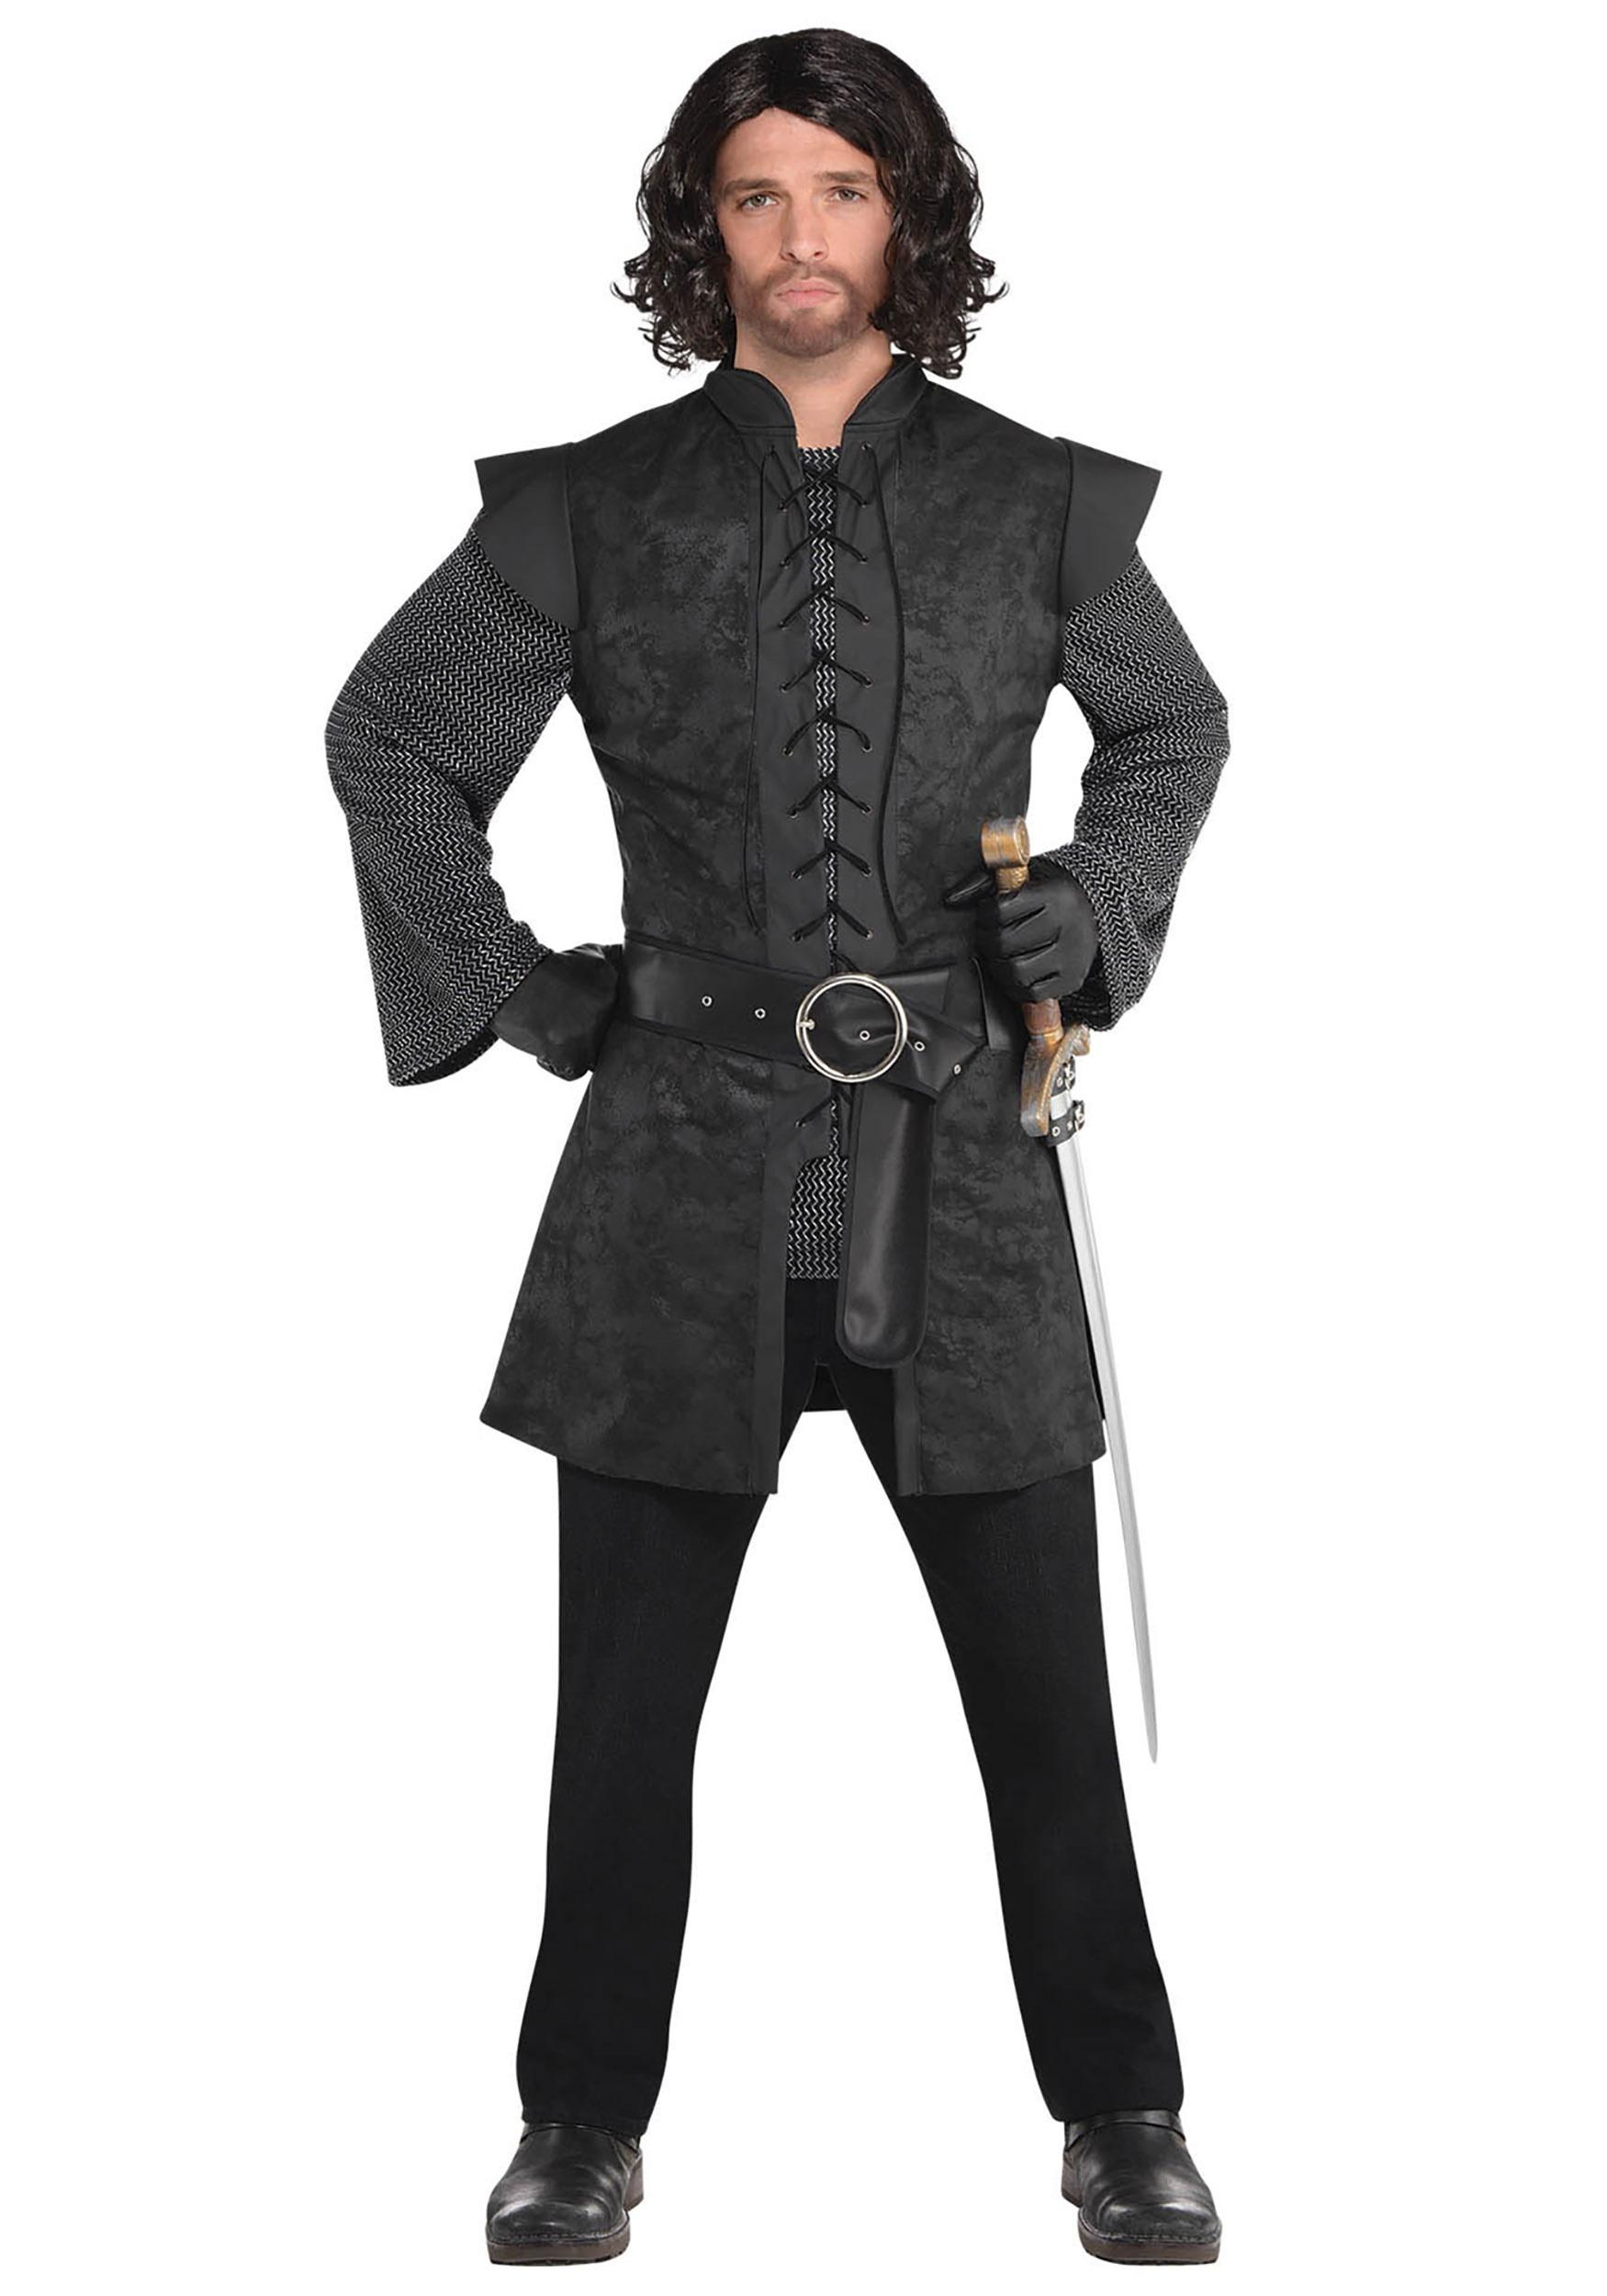 Warrior_Black_Tunic_Men's_Costume